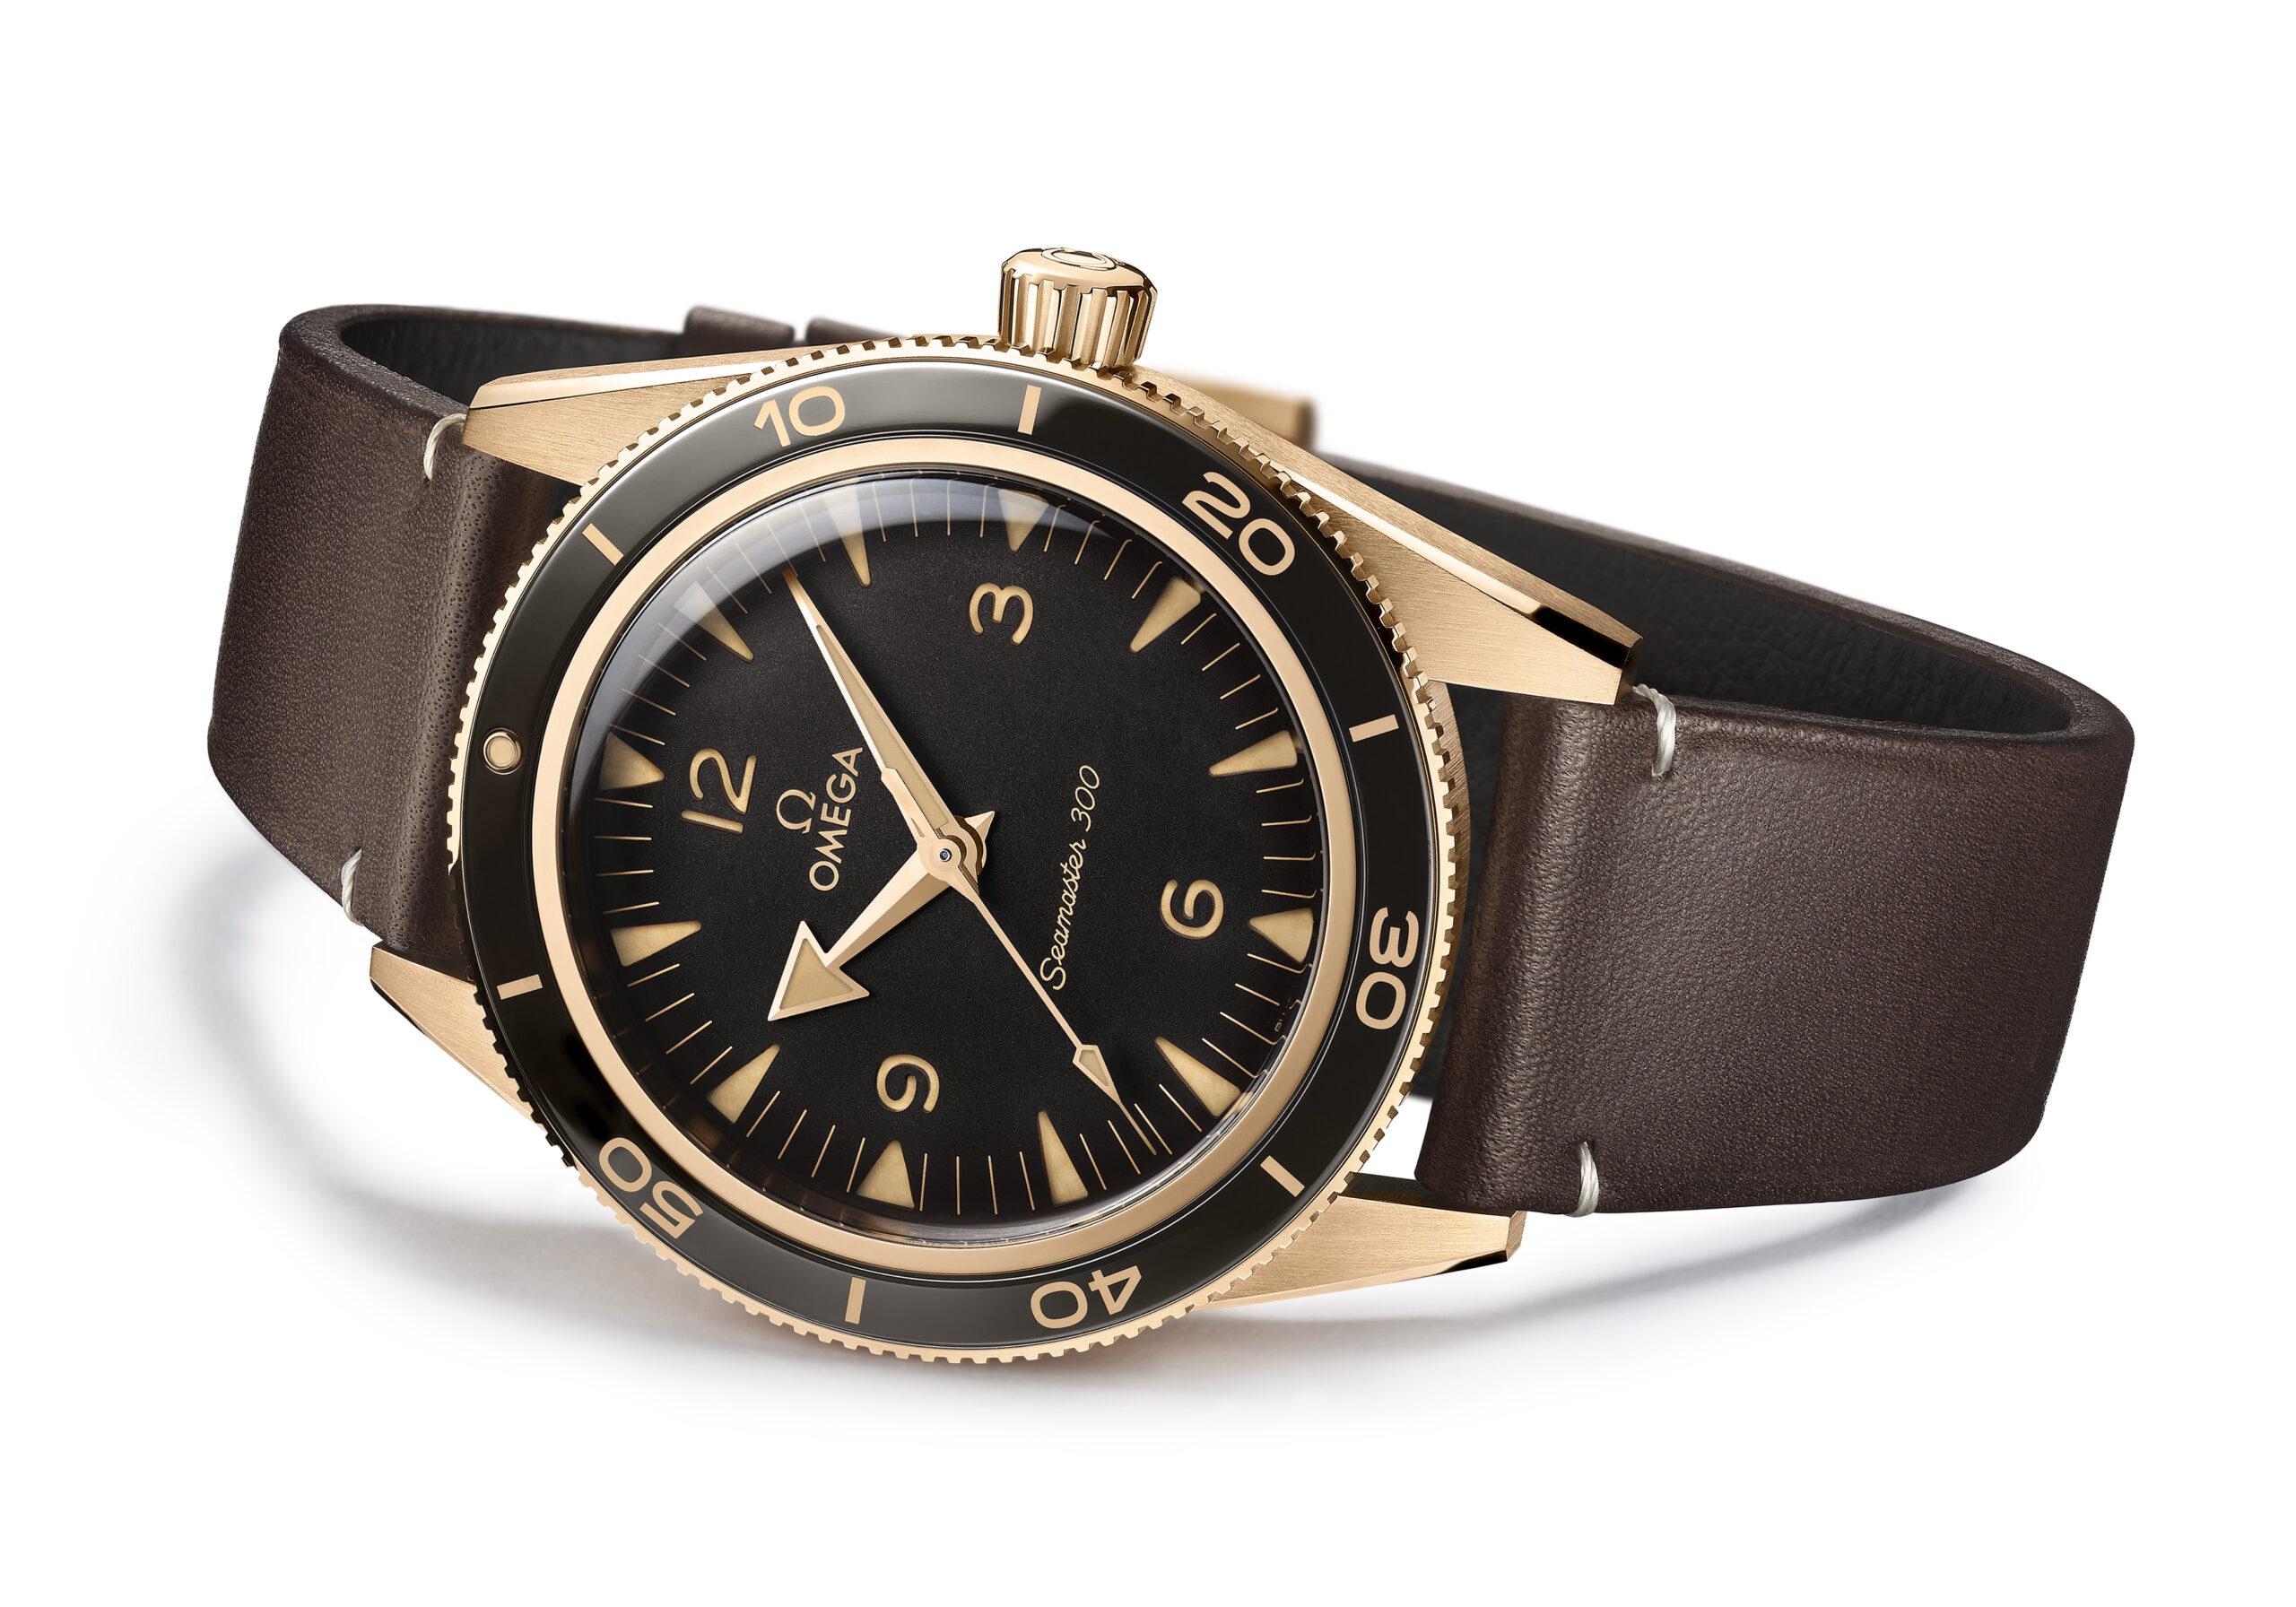 Omega Seamaster 300 Bronze Gold relojes